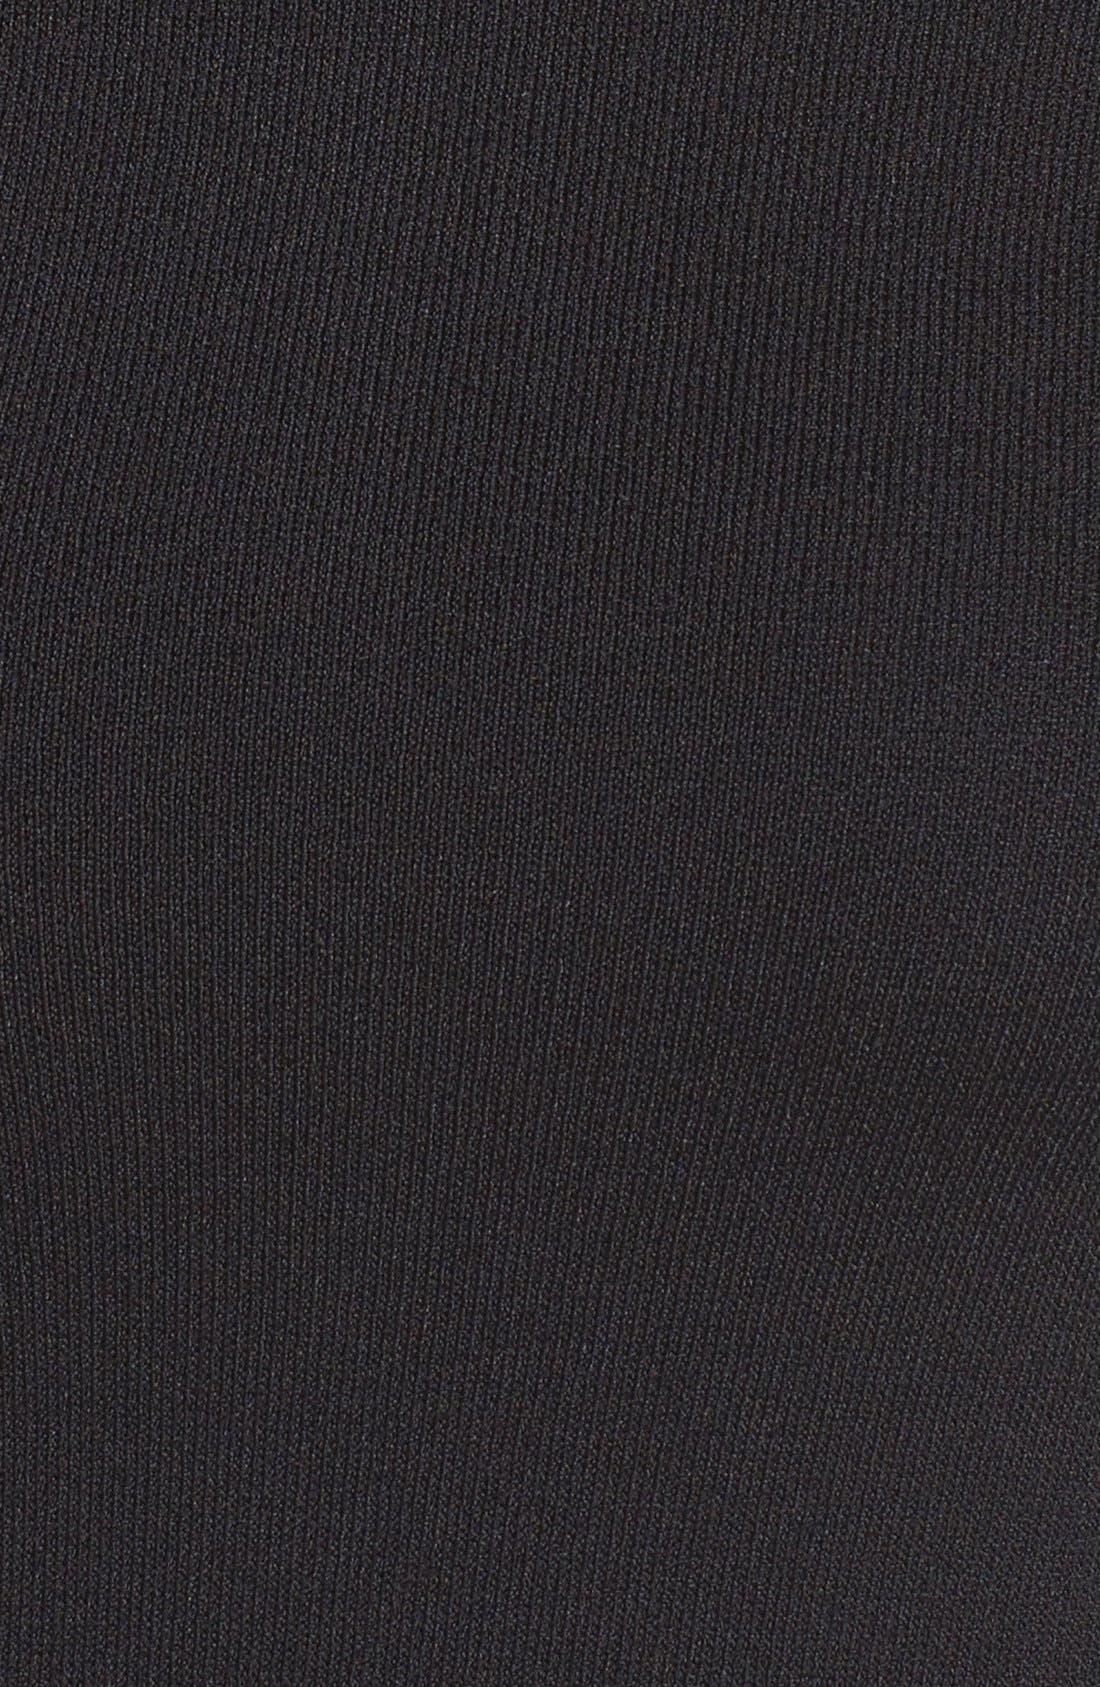 Cold Shoulder Knit Body-Con Dress,                             Alternate thumbnail 8, color,